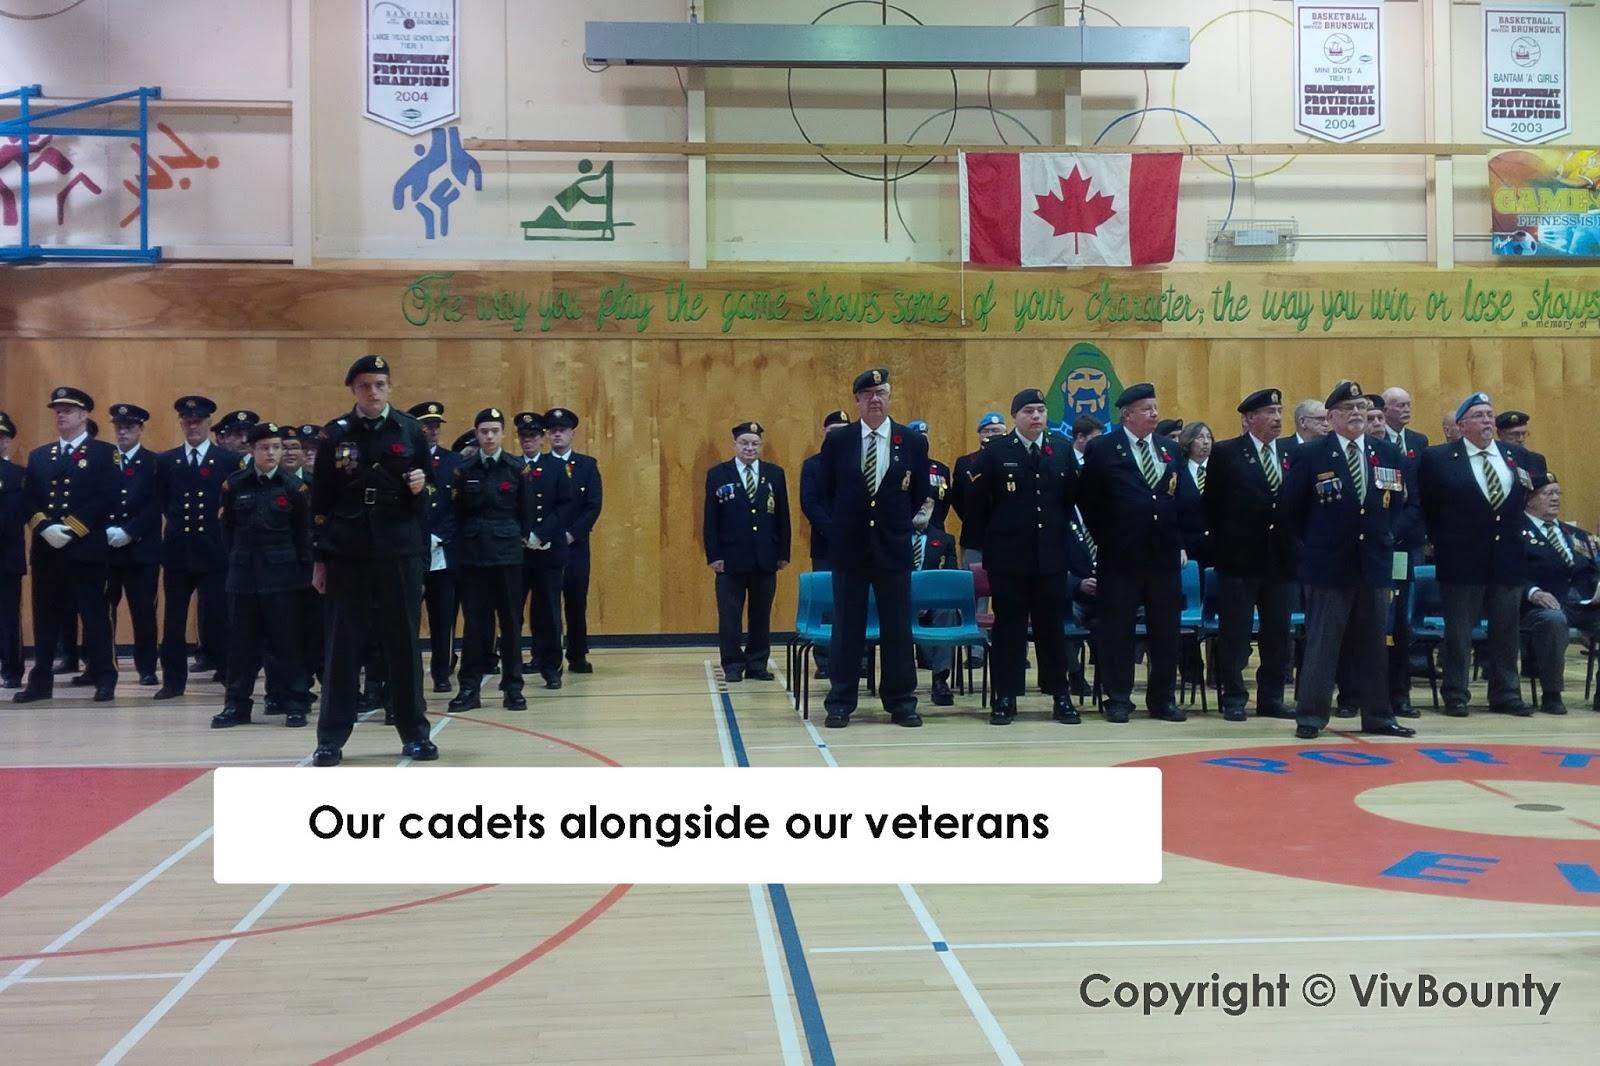 Cadets alongside our veterans, VivBounty